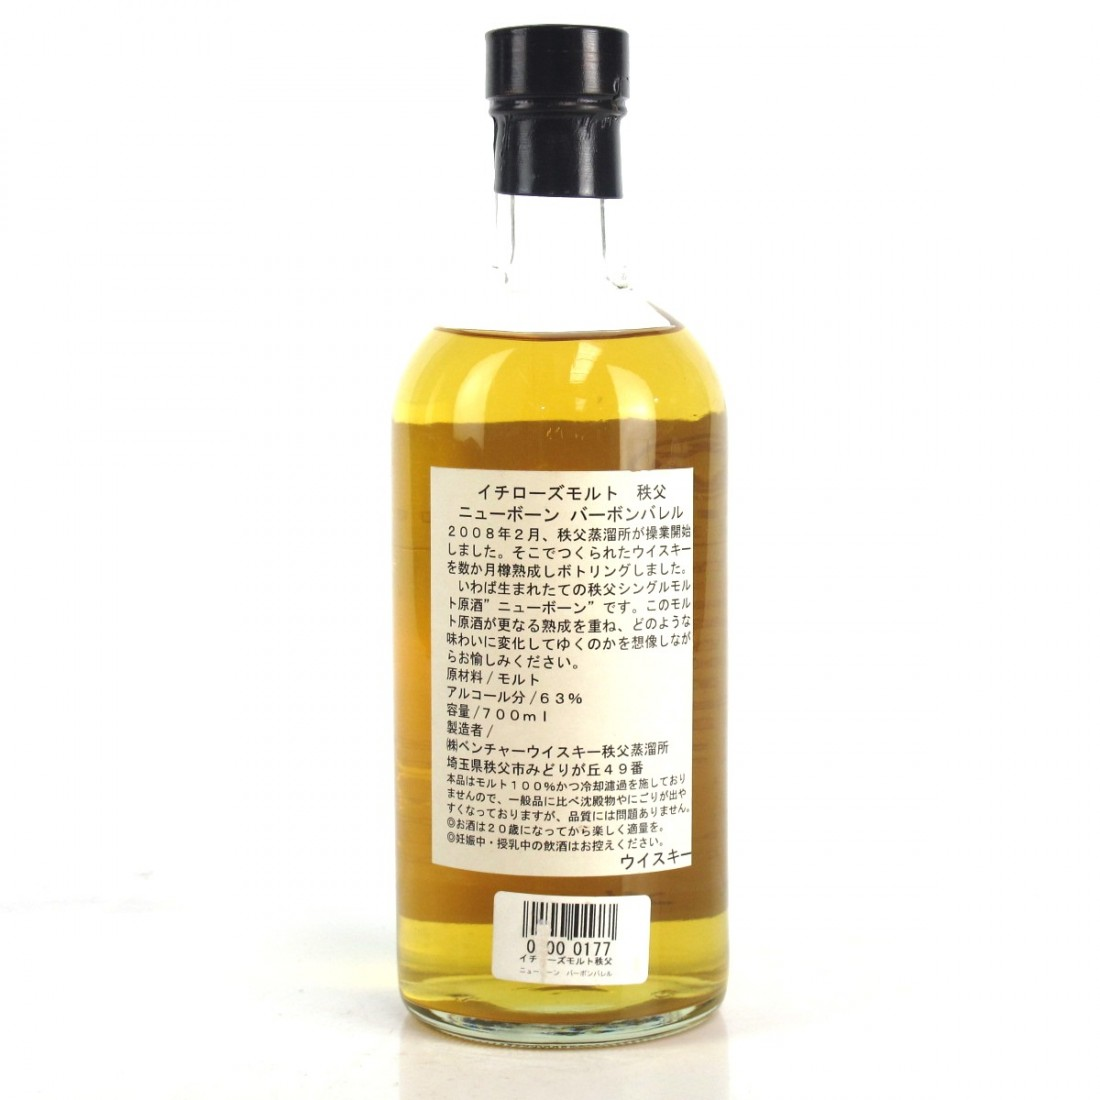 Chichibu 2008 Ichiro's Malt Single Cask #80 / Newborn Bourbon Barrel